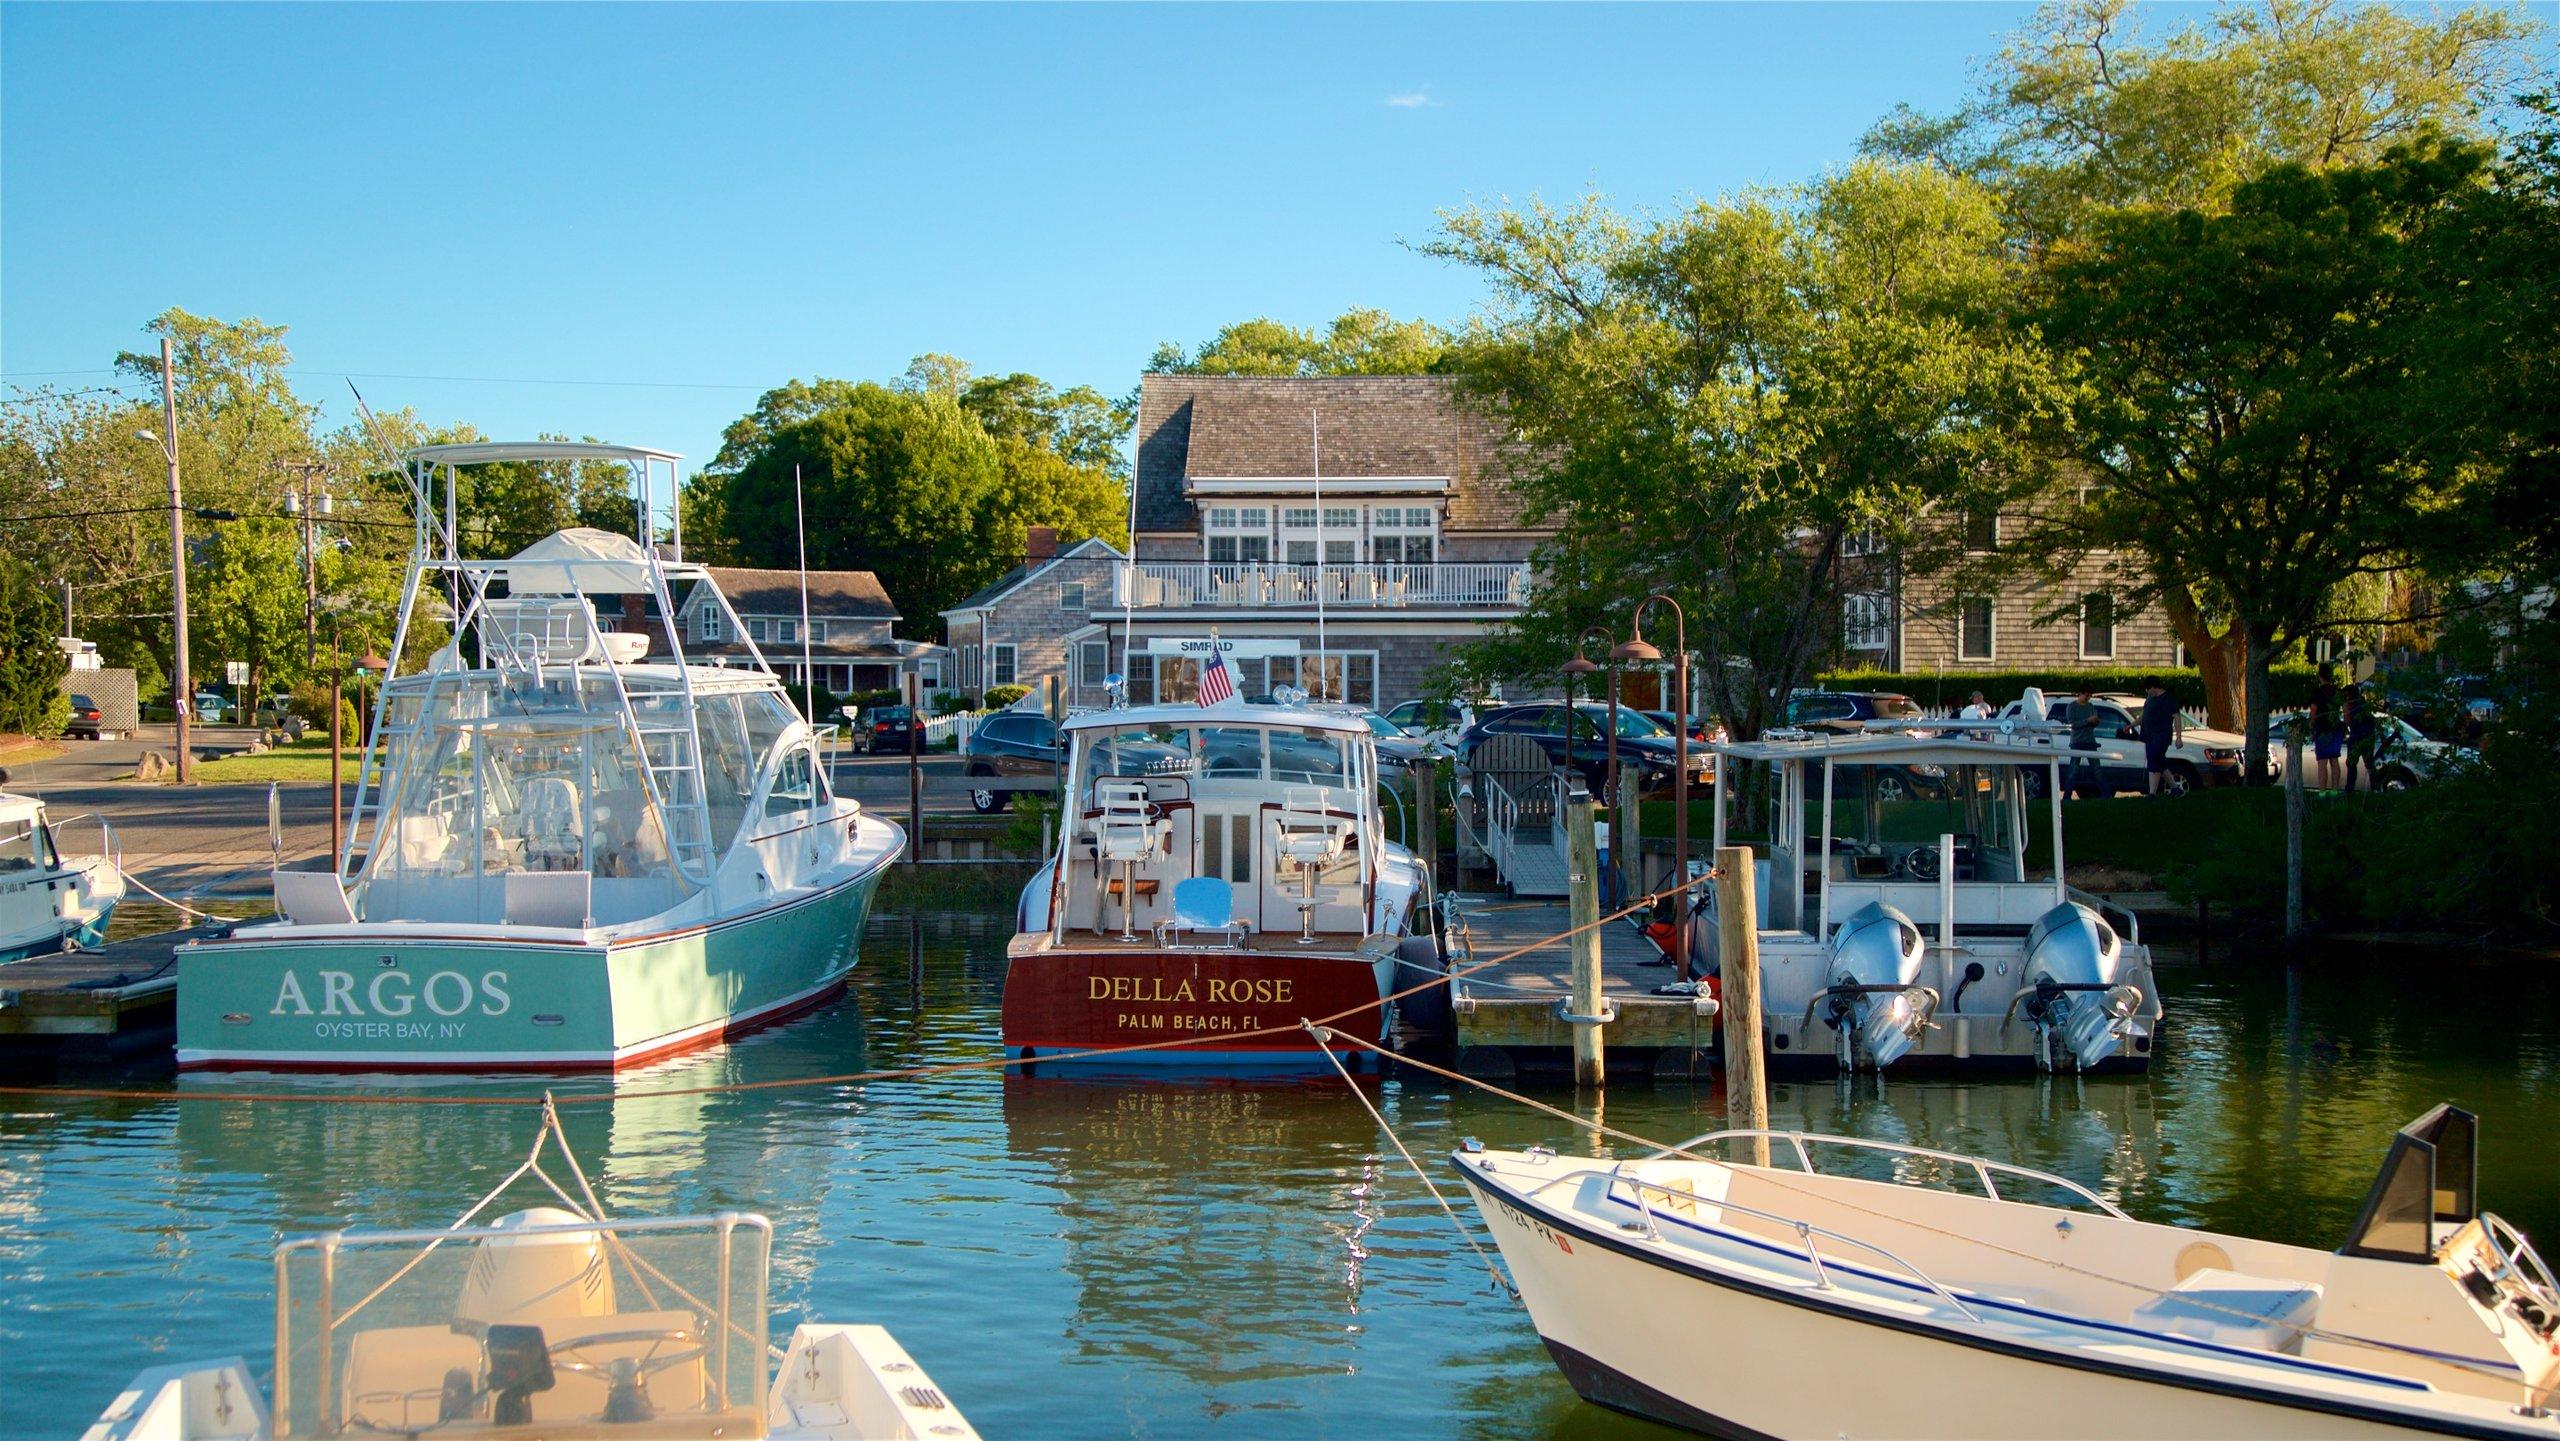 Sag Harbor, New York, United States of America